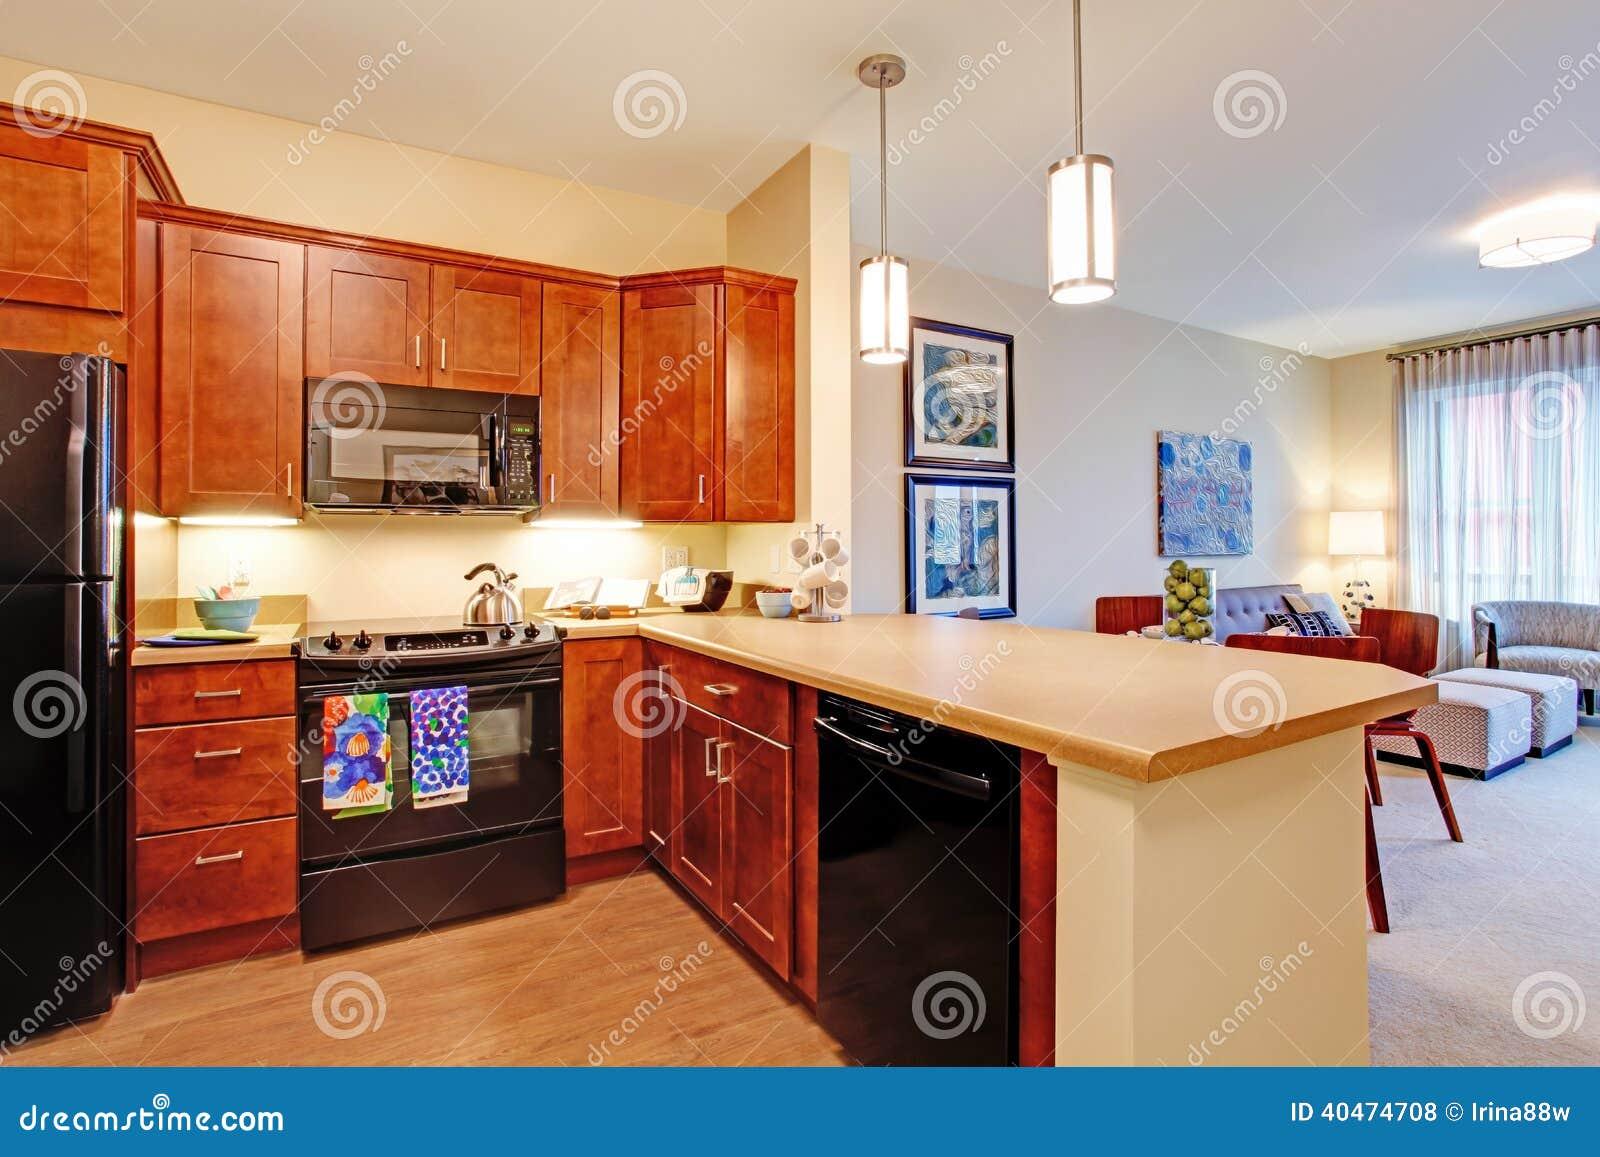 modernes appartement interieur, intérieur moderne d'appartement plan d'étage ouvert photo stock, Design ideen